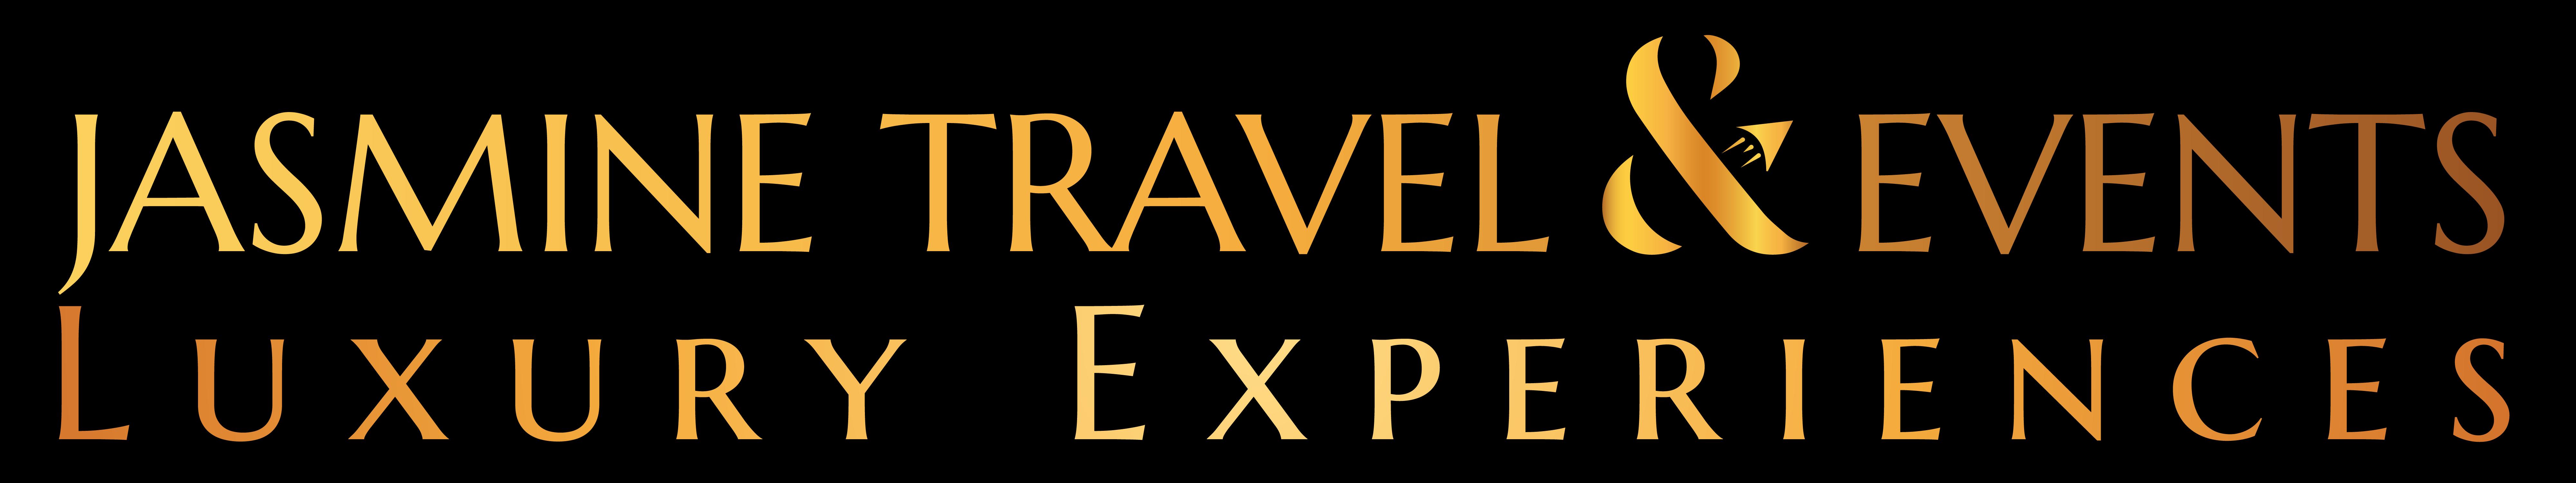 Jasmine Travel & Events